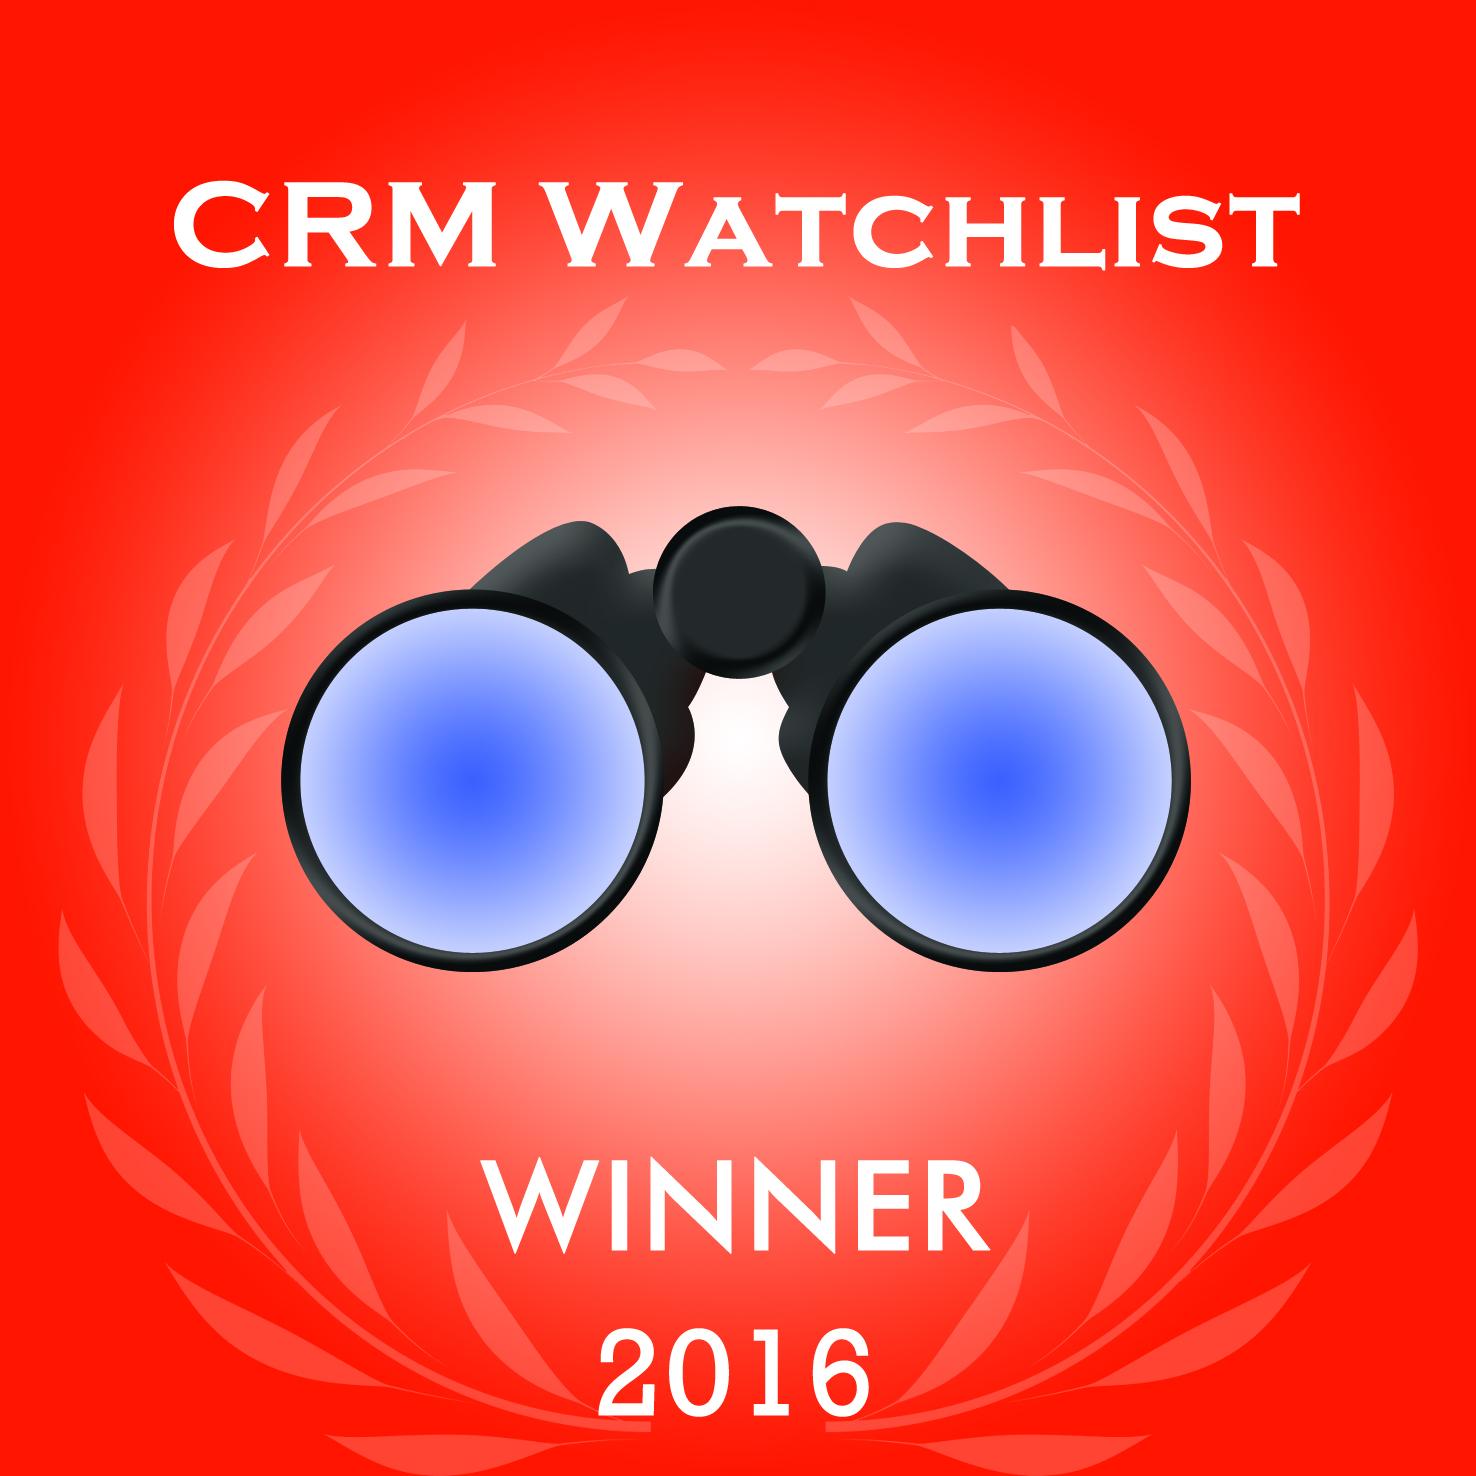 crmwatchlist_winner_v1_2016.jpg